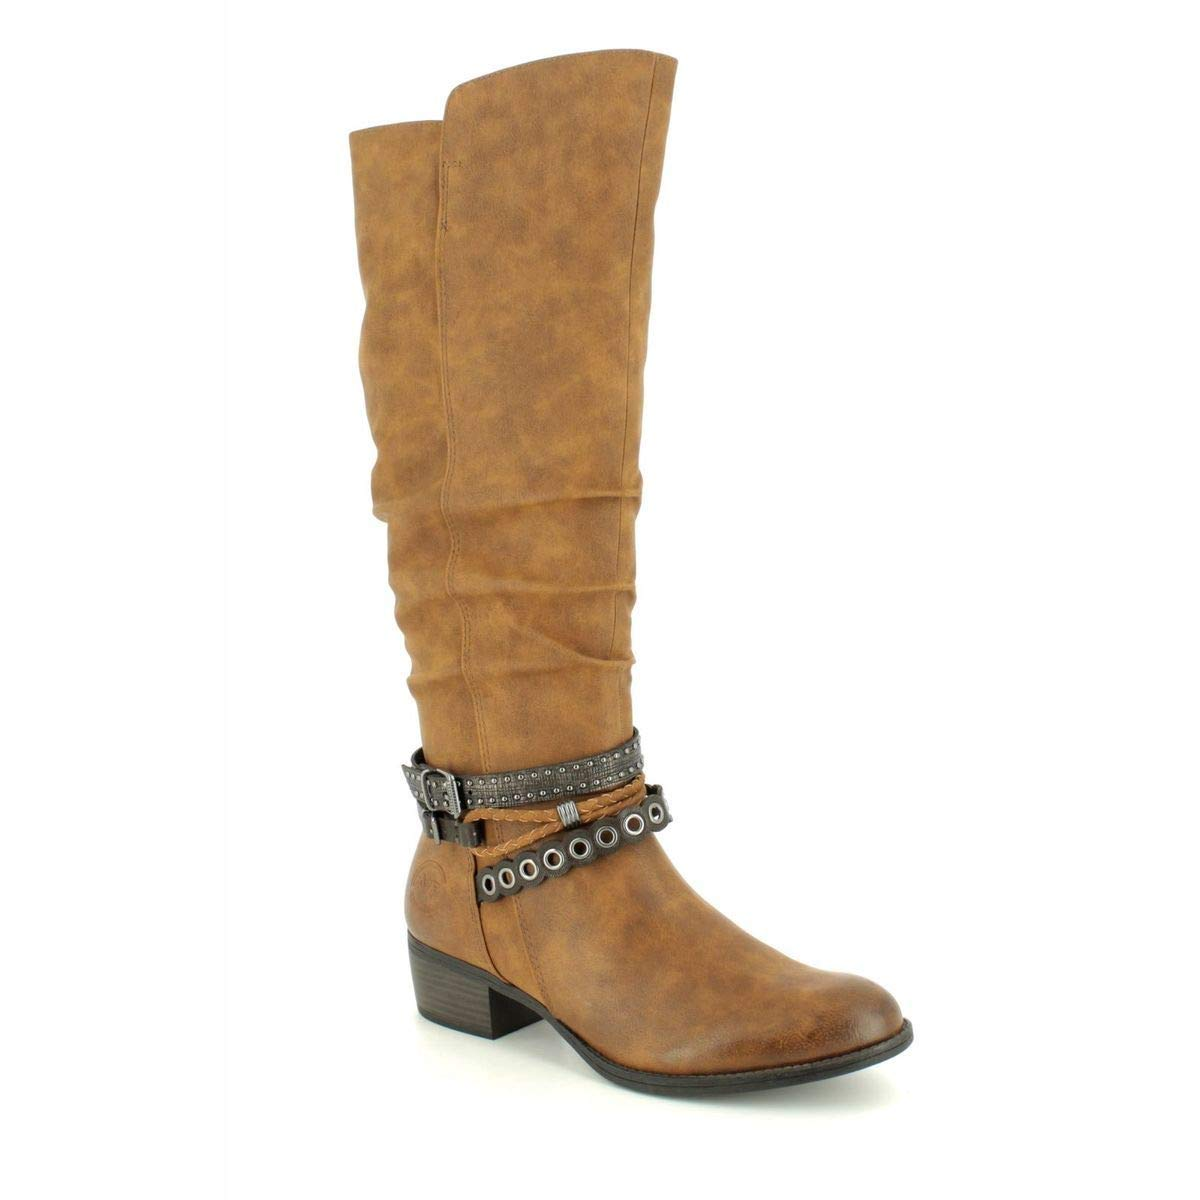 21 2 Femmes femme MARCO Botte TOZZI Chaussures 25525 yOmN80vnw